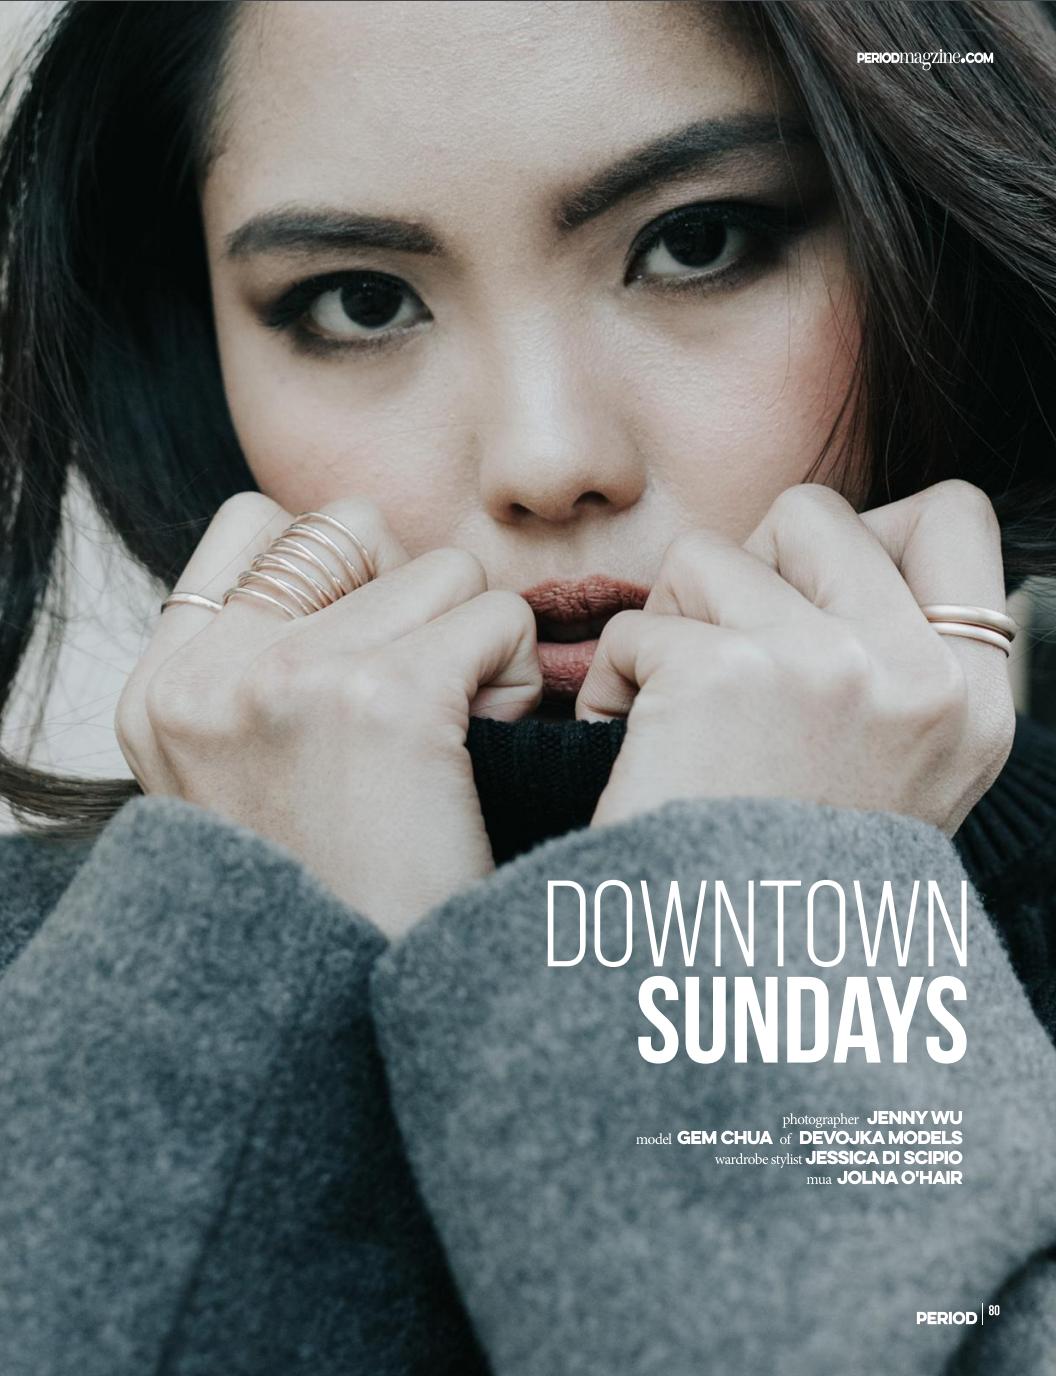 Downtown Sundays editorial: Photography Jenny Wu Gem wearing grey trench styled by Jess Discipio